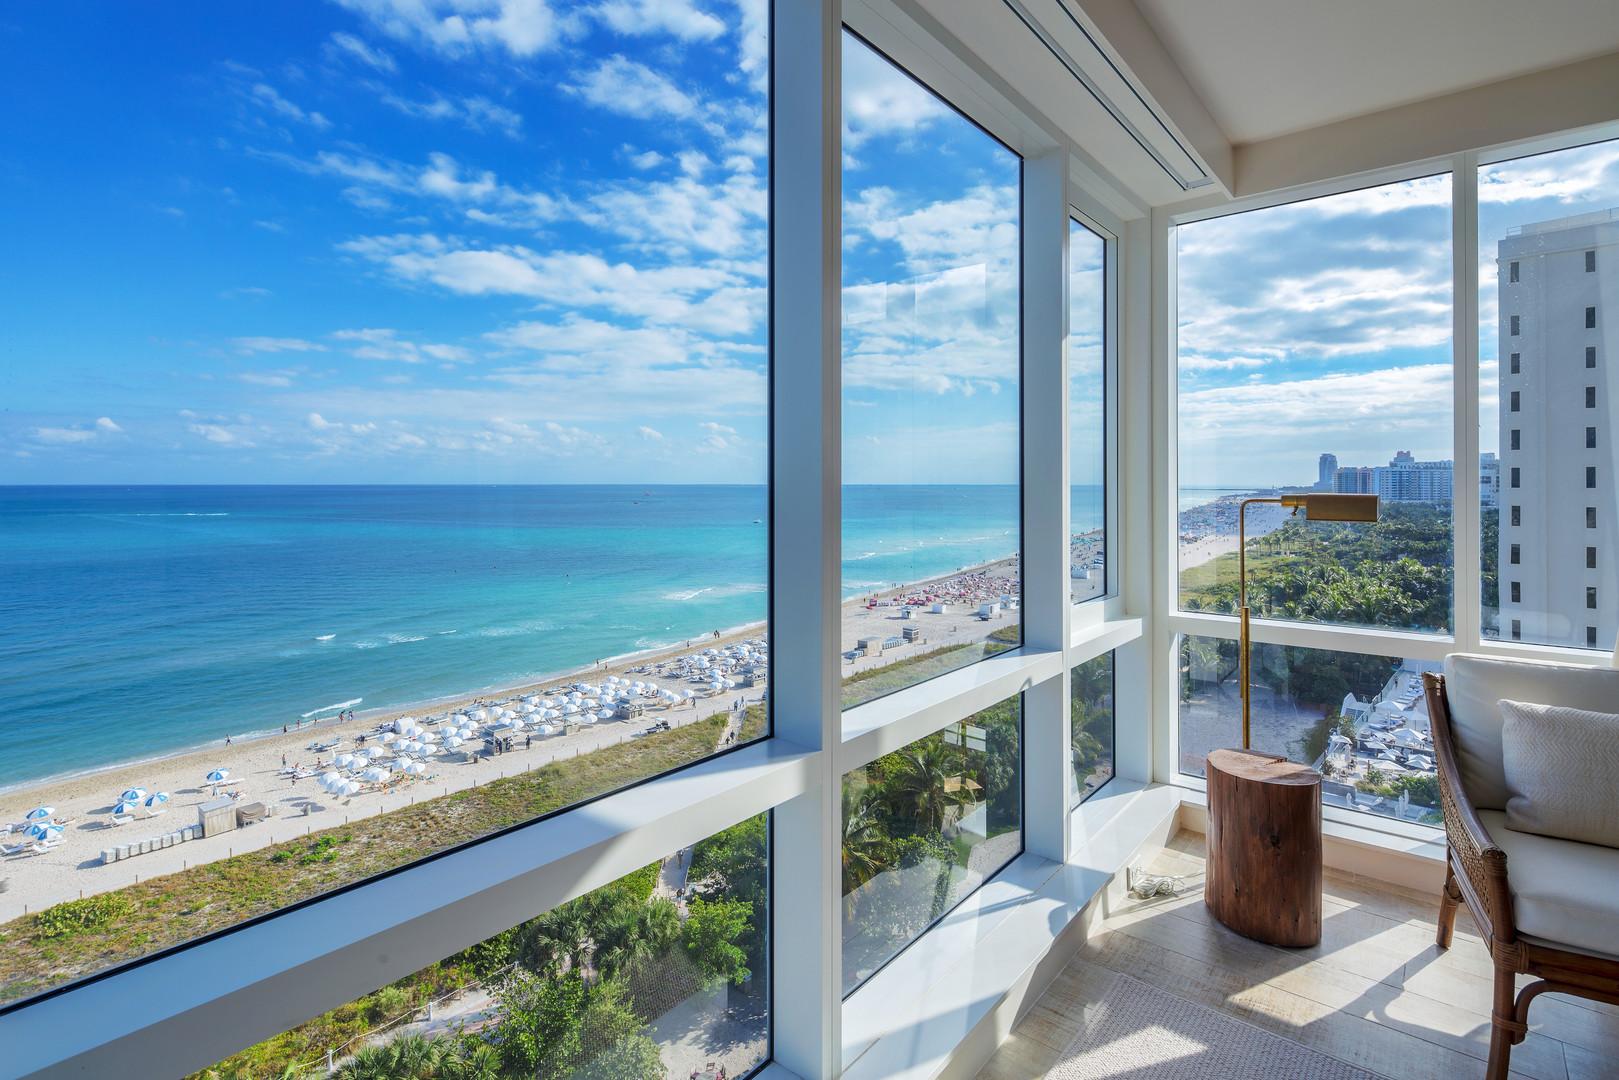 2 Bedroom Direct Ocean Condo at 1 Hotel & Homes South Beach